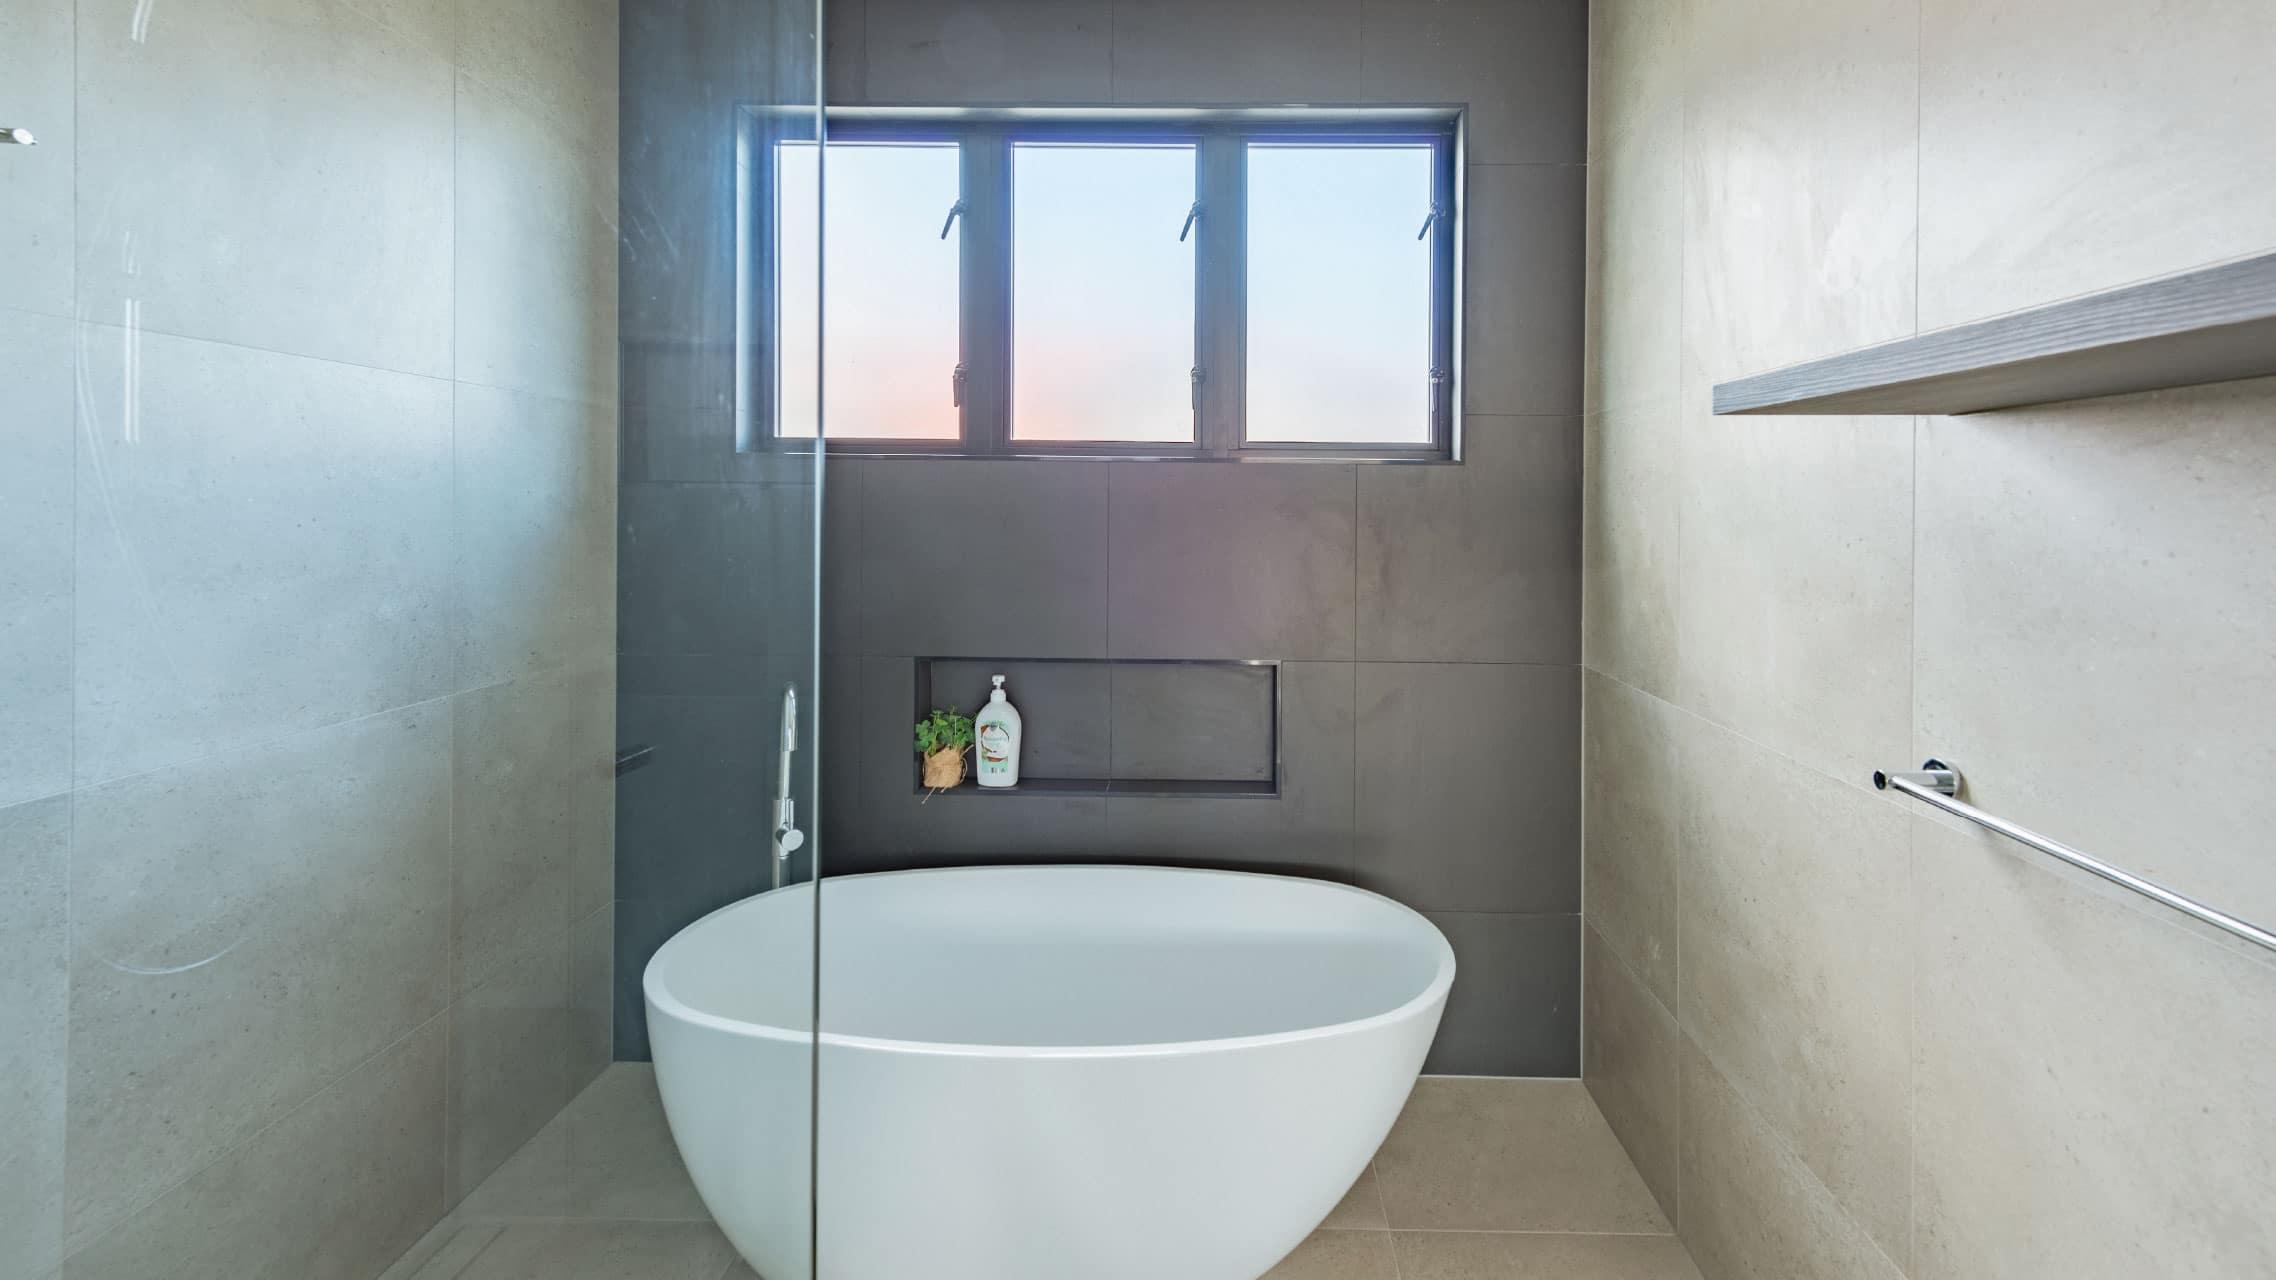 Casement Window in a bathroom